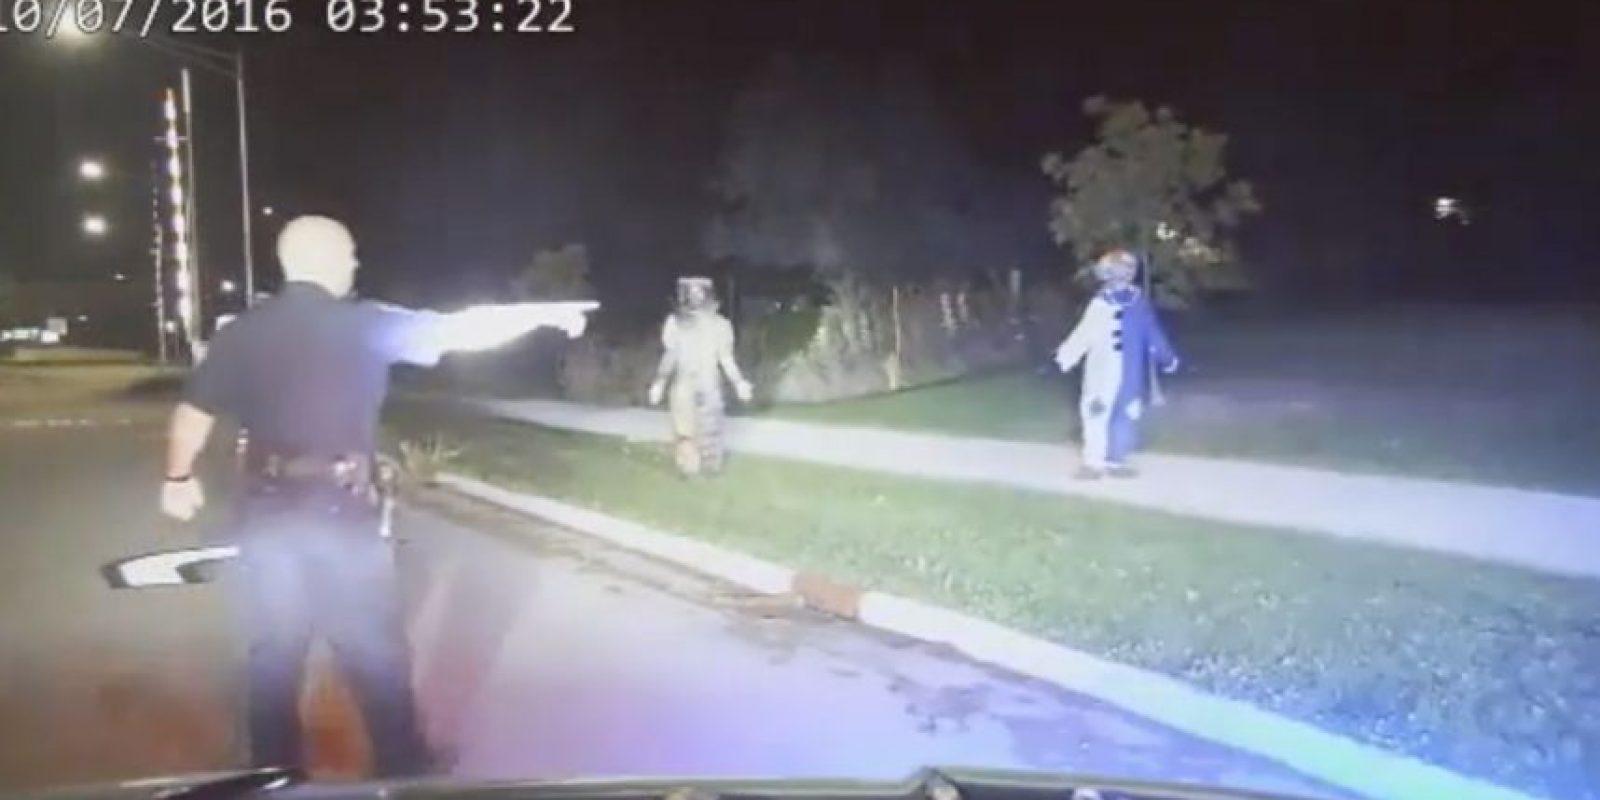 La pareja estaba aterrorizando a personas Foto:Menasha Police Department i